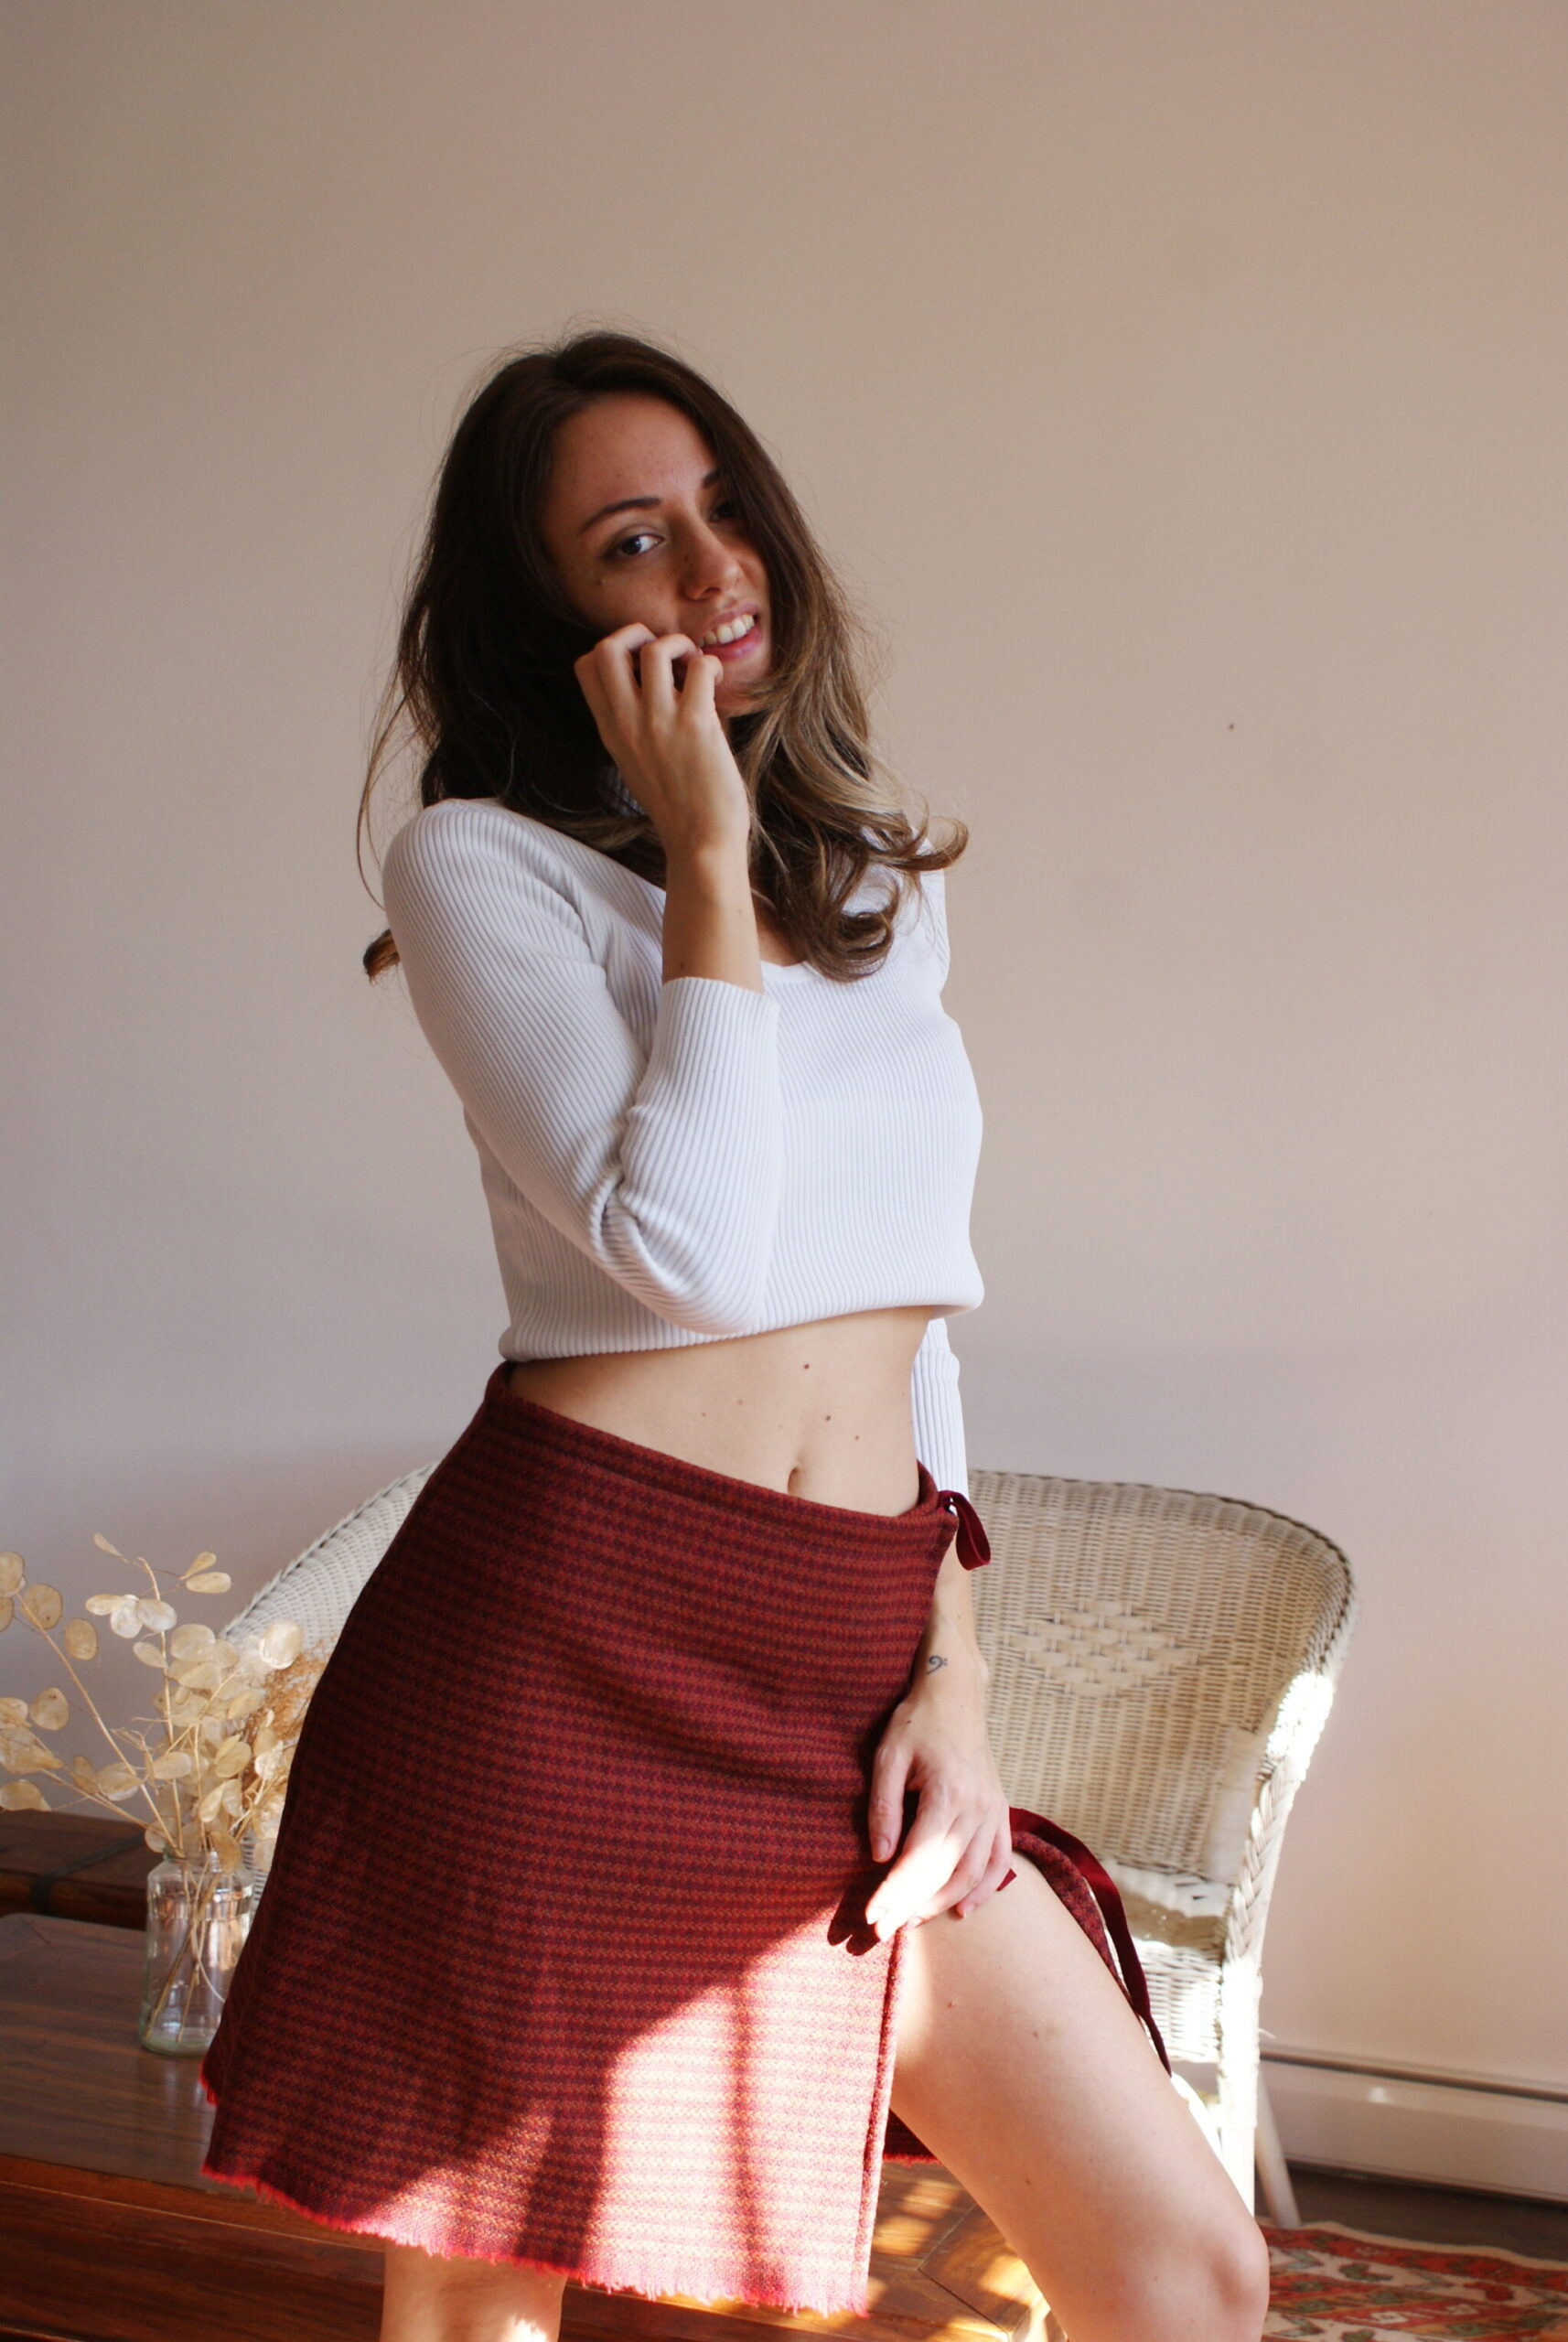 diy mini wrap wool skirt easy sewing tutorial simple free sample francinesplaceblog lace tartan plaid